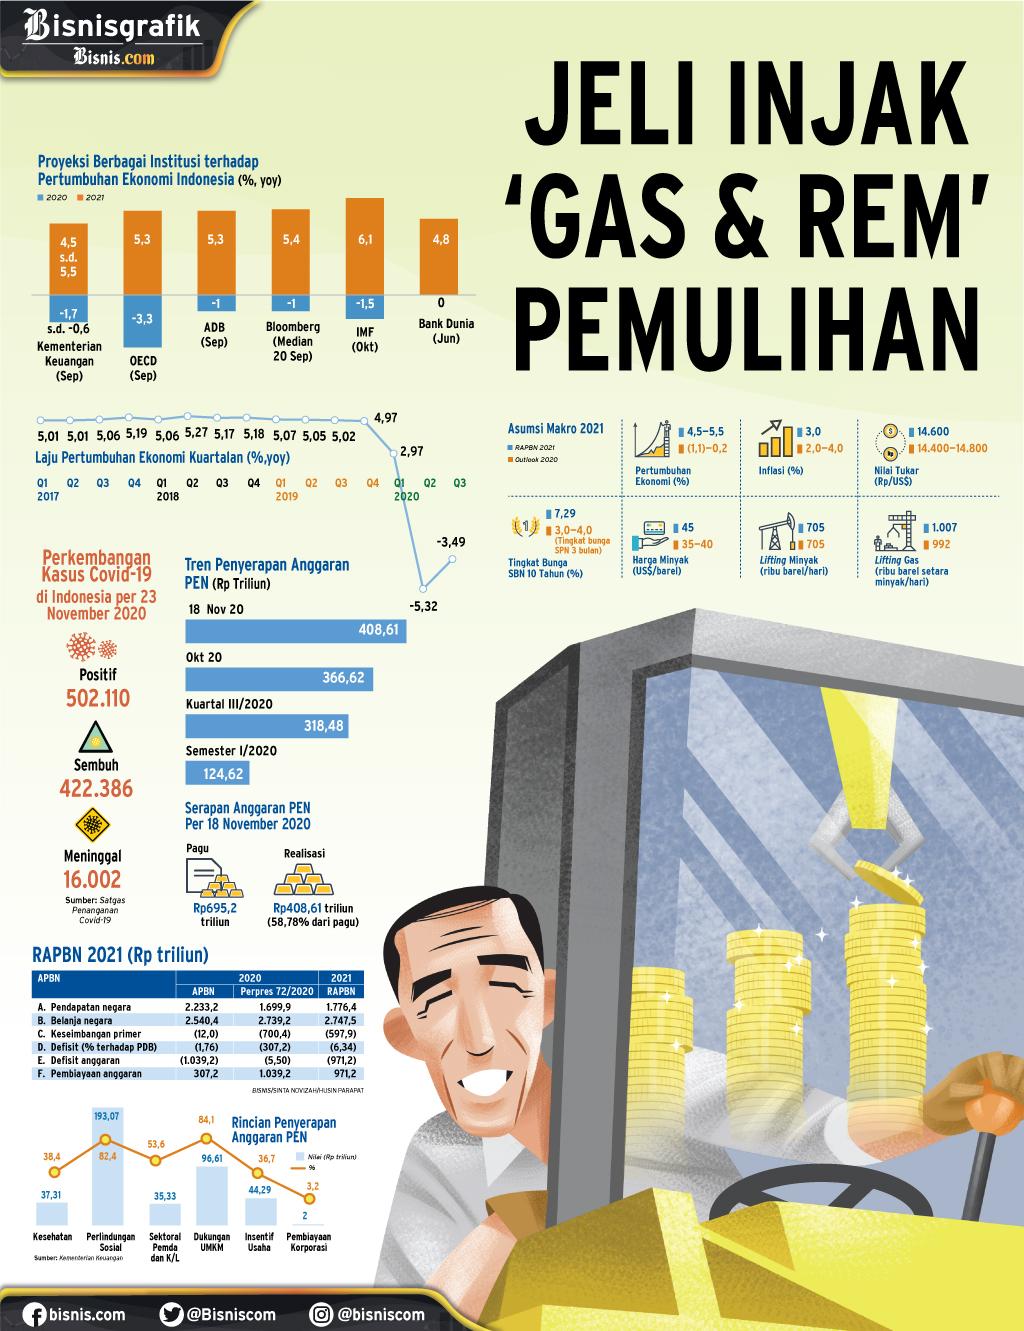 PERTUMBUHAN EKONOMI : Jeli Injak 'Gas & Rem' Pemulihan